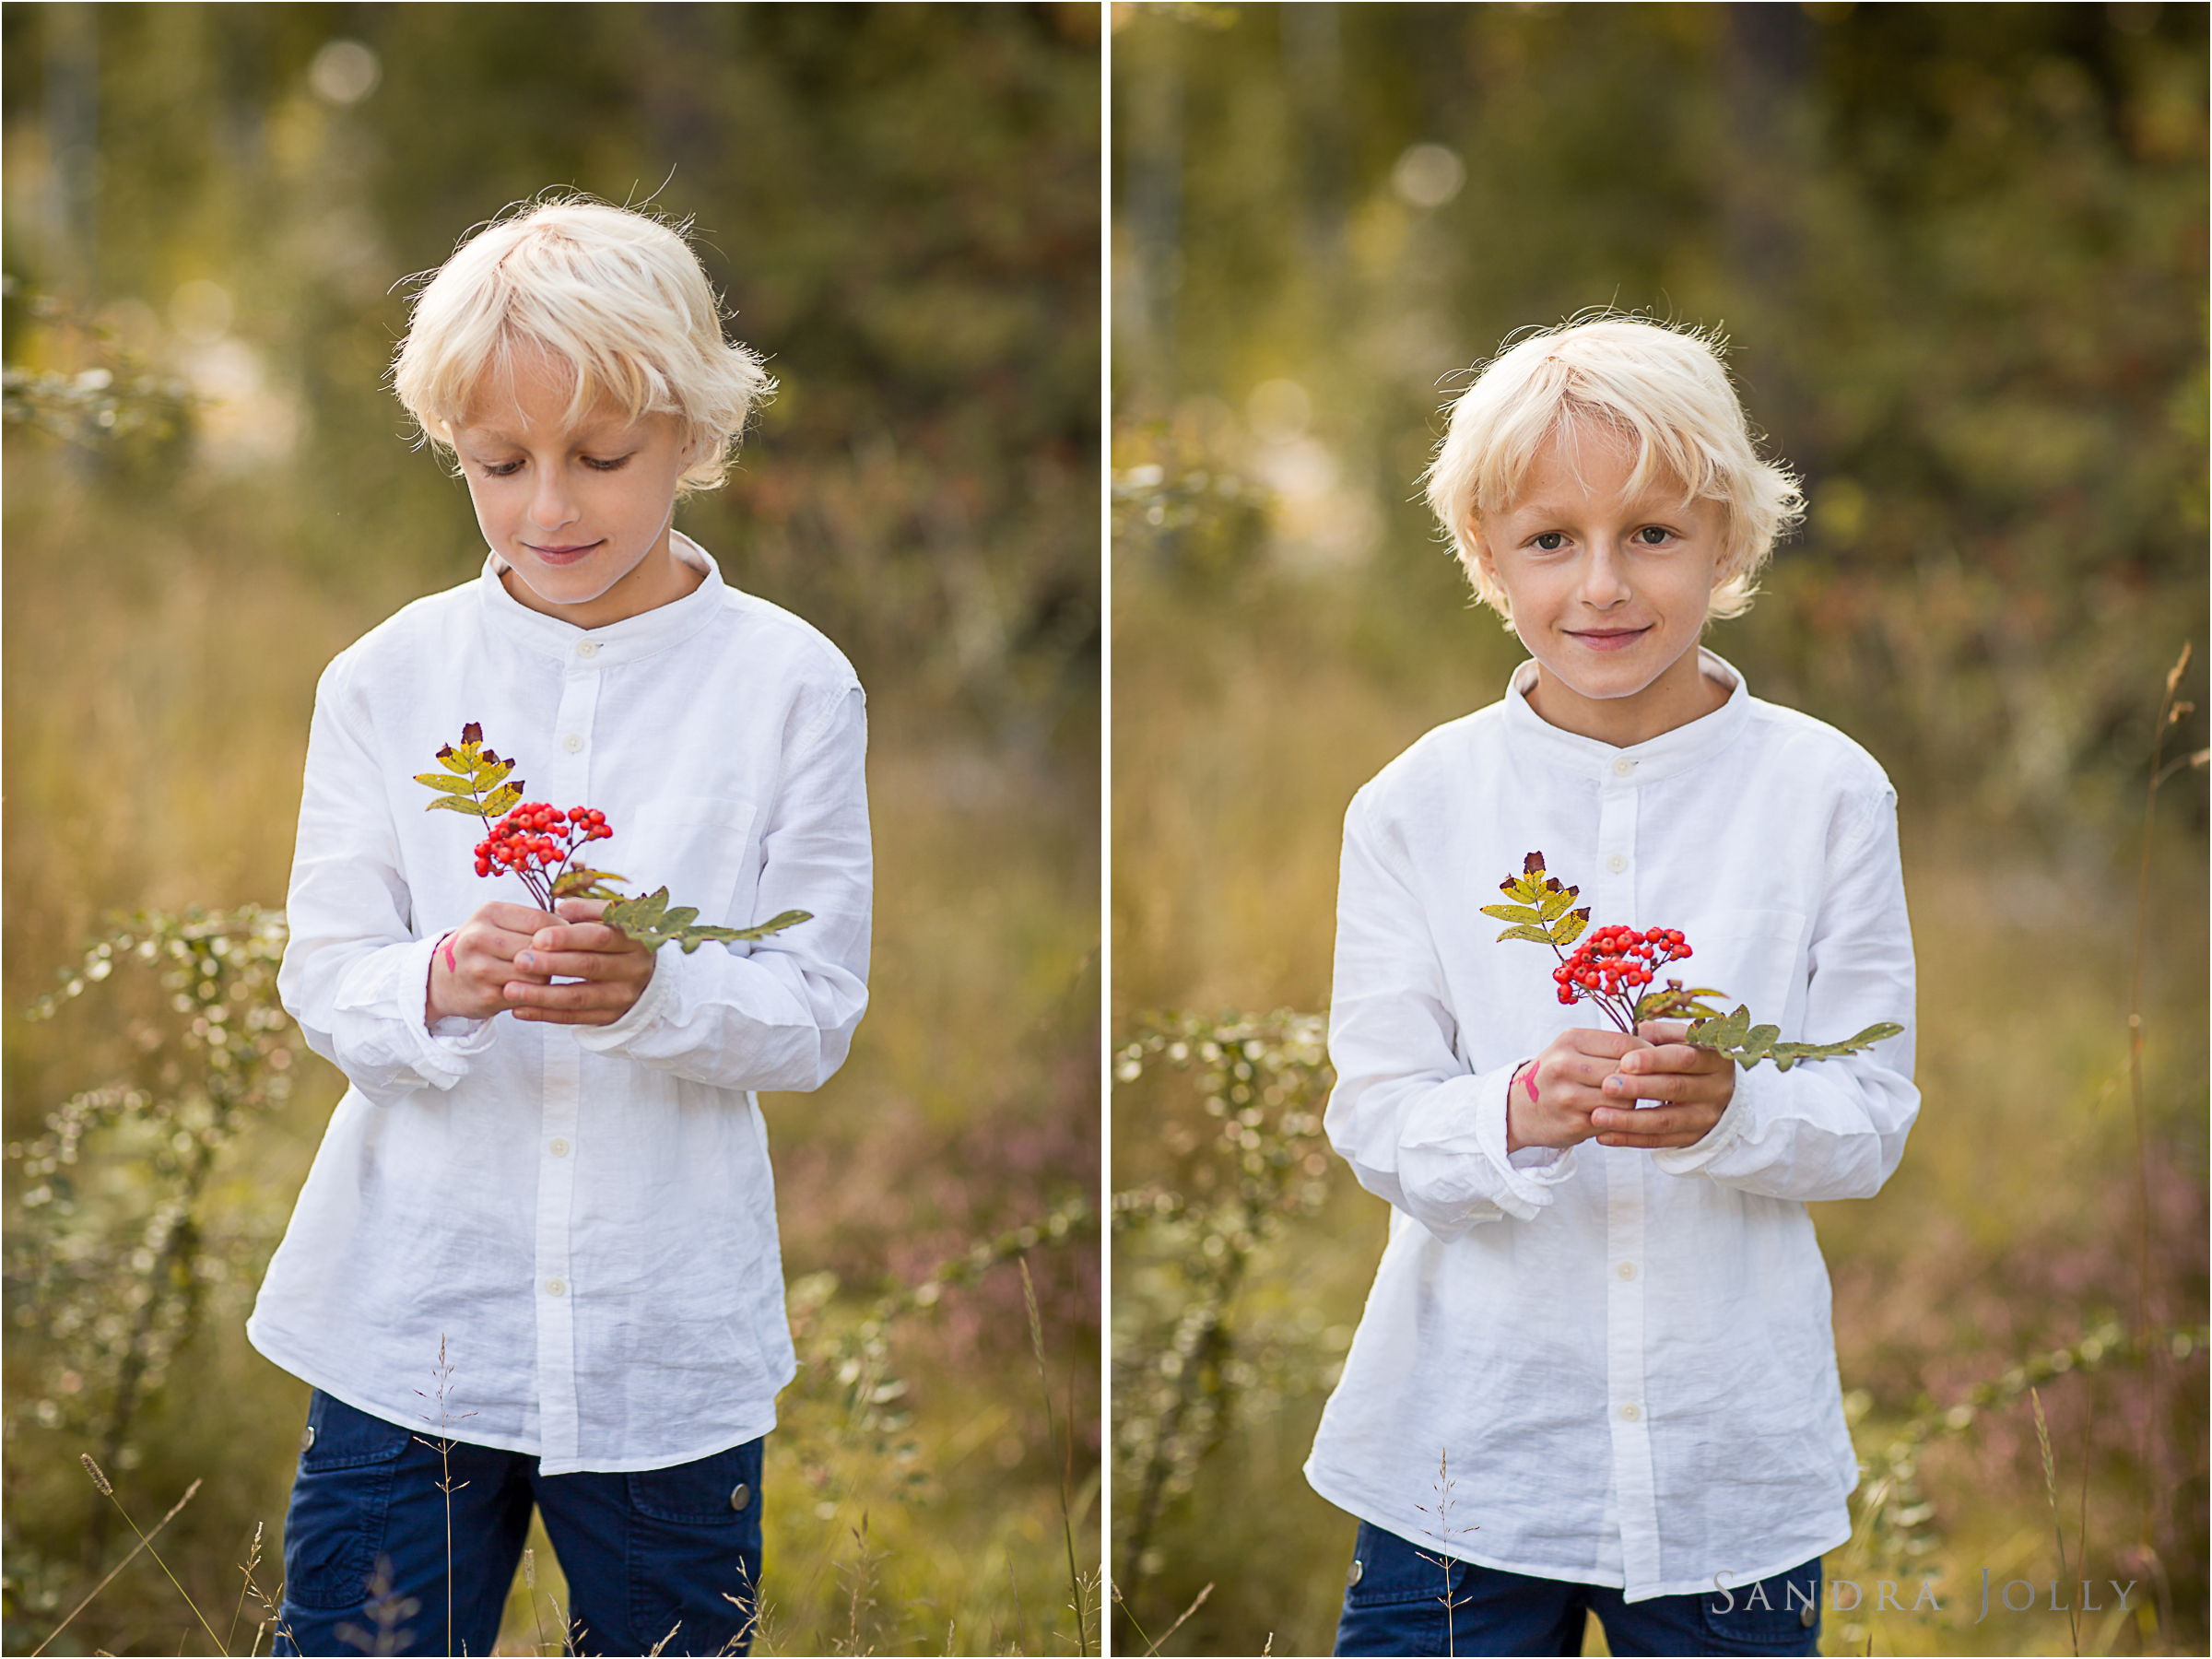 Sandra Jolly Photography  3.jpg